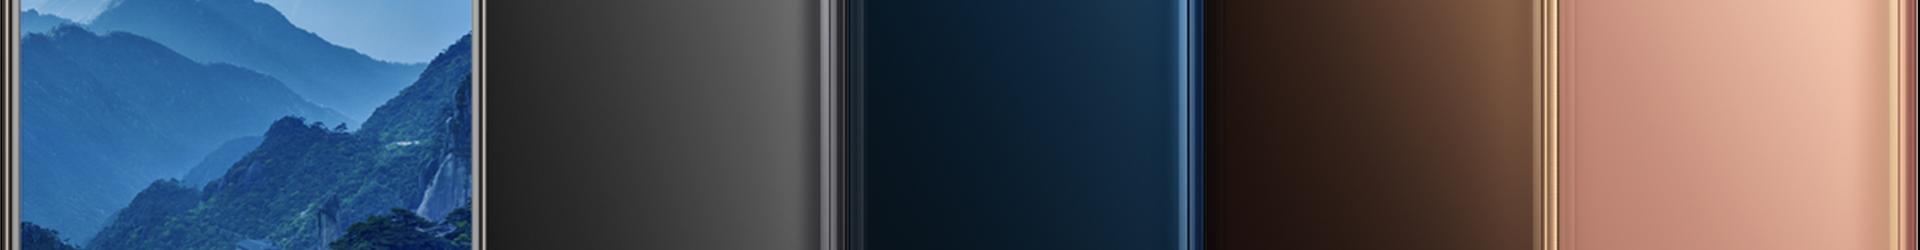 Huawei Mate 10 e Mate 10 Pro ufficiali: belli, potenti ed intelligenti